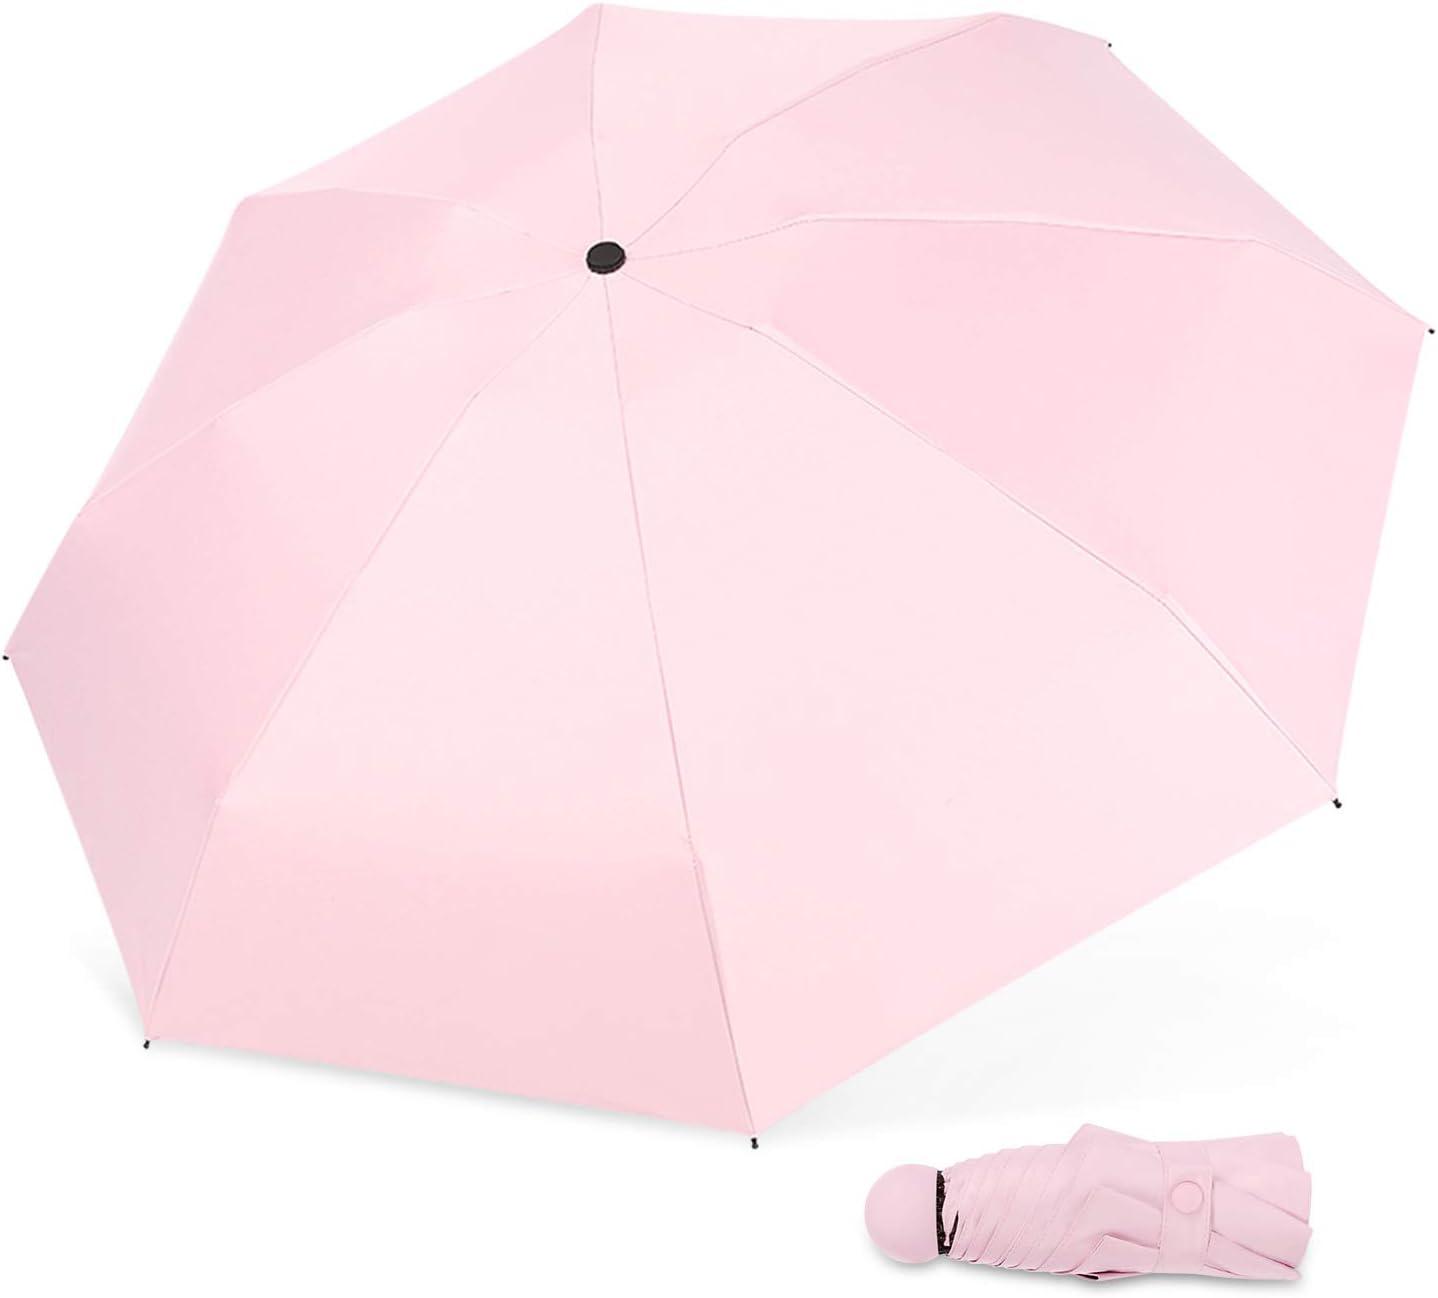 MARCELEN Ultra Light Mini Anti-UV Foldin Outlet SALE low-pricing Compact Travel Umbrella